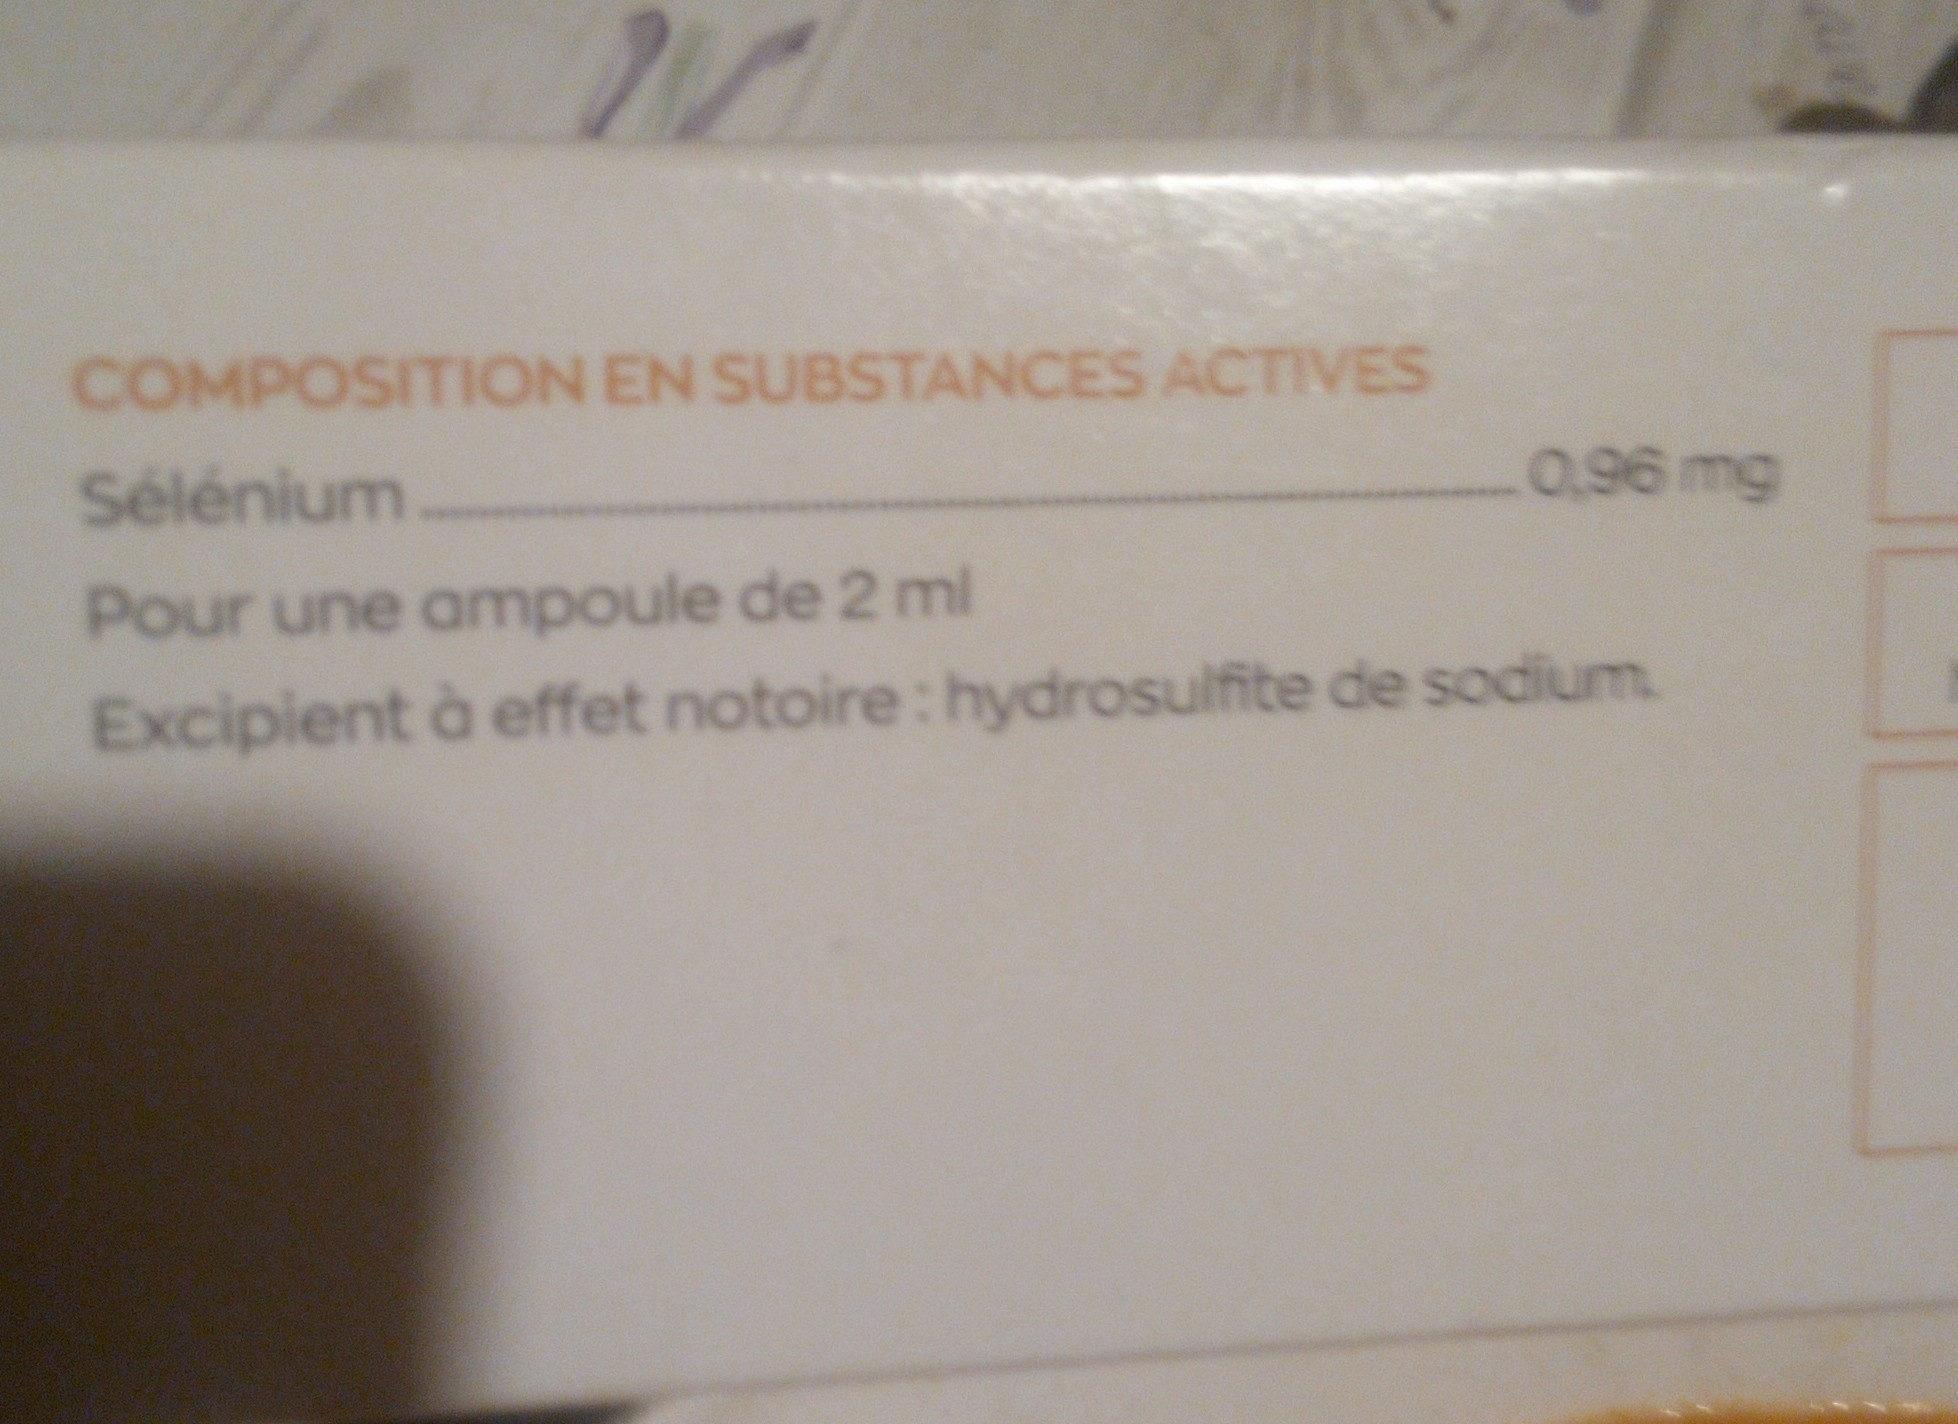 granions de sélénium - Nährwertangaben - fr